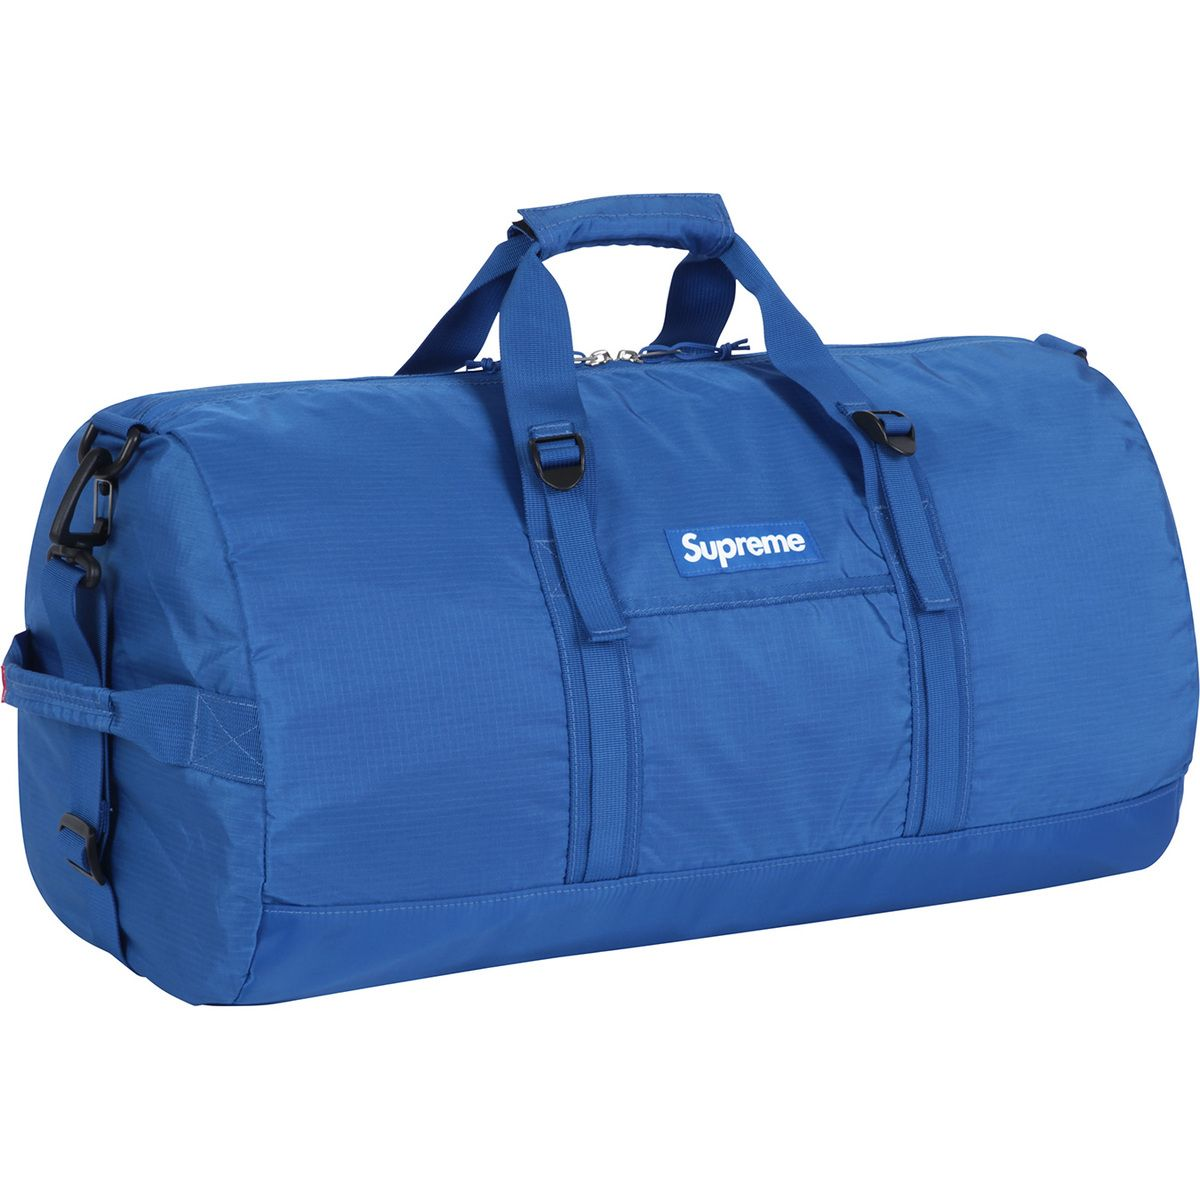 Supreme Duffle Bag  f68ac18ca5836